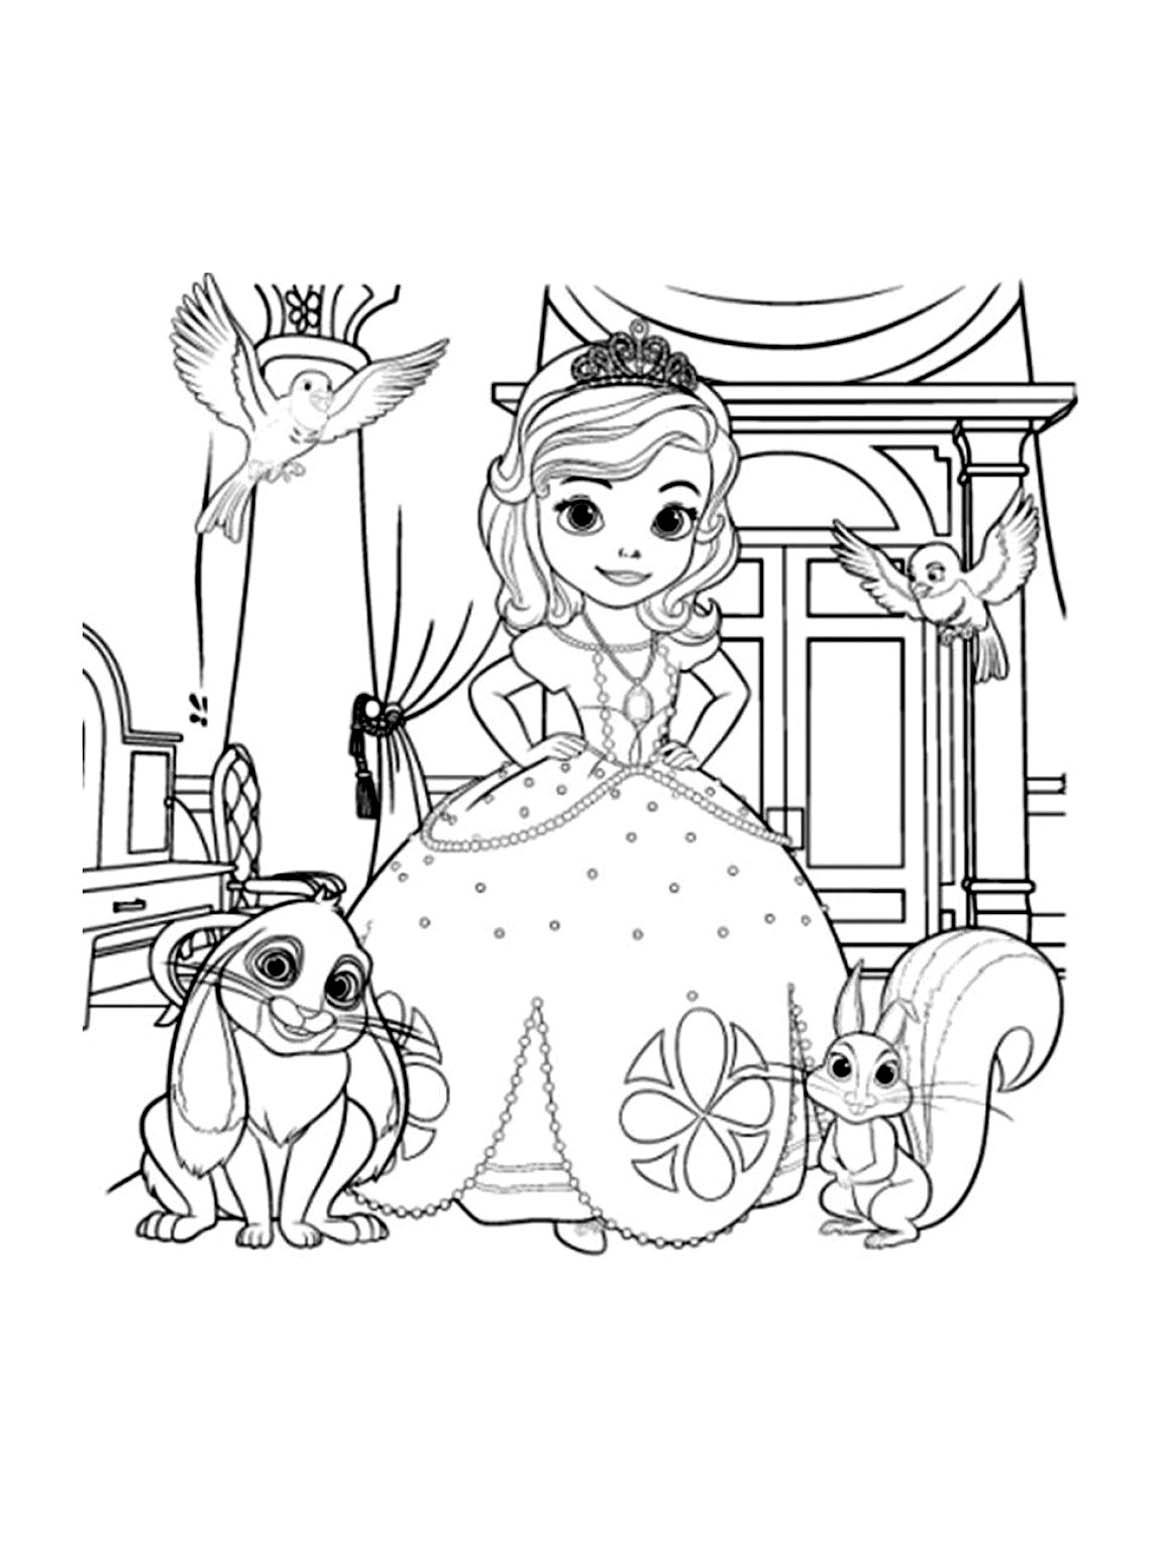 Coloriage De Princesse Sofia Disney Gratuit À Colorier encequiconcerne Princesse À Colorier Gratuit